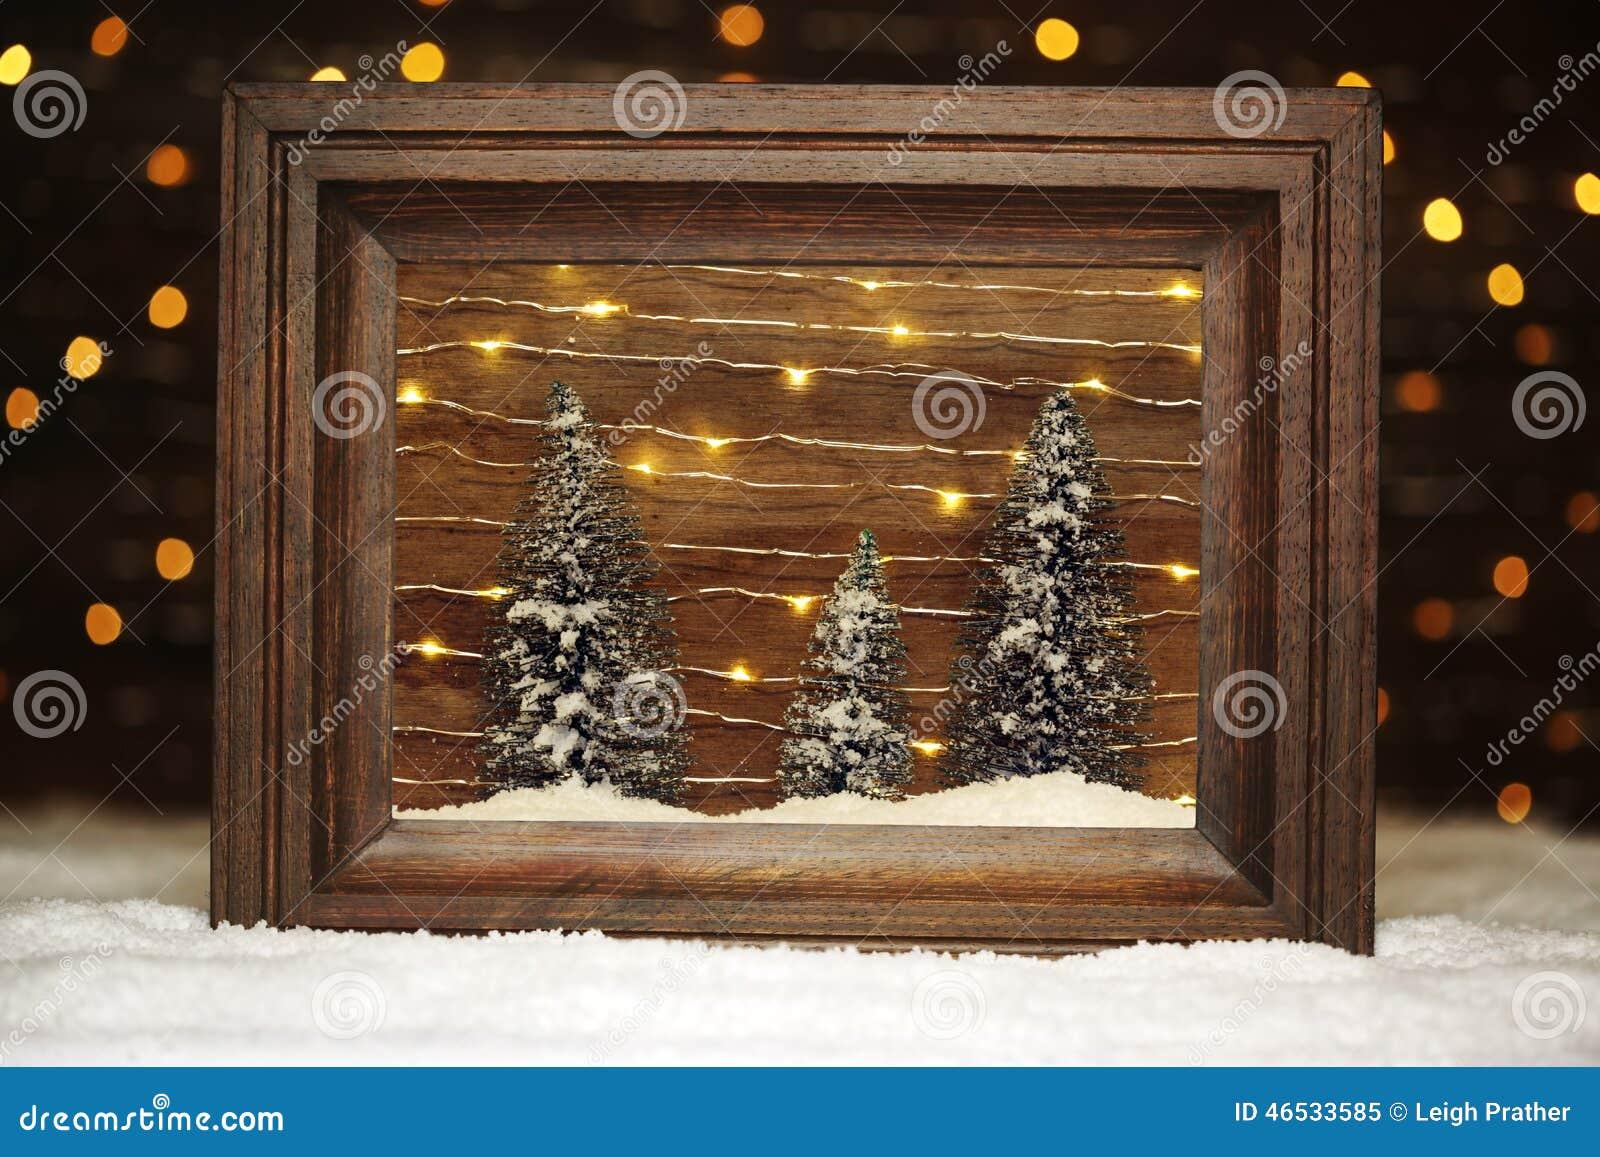 ruhige winterszene stockfoto bild 46533585. Black Bedroom Furniture Sets. Home Design Ideas